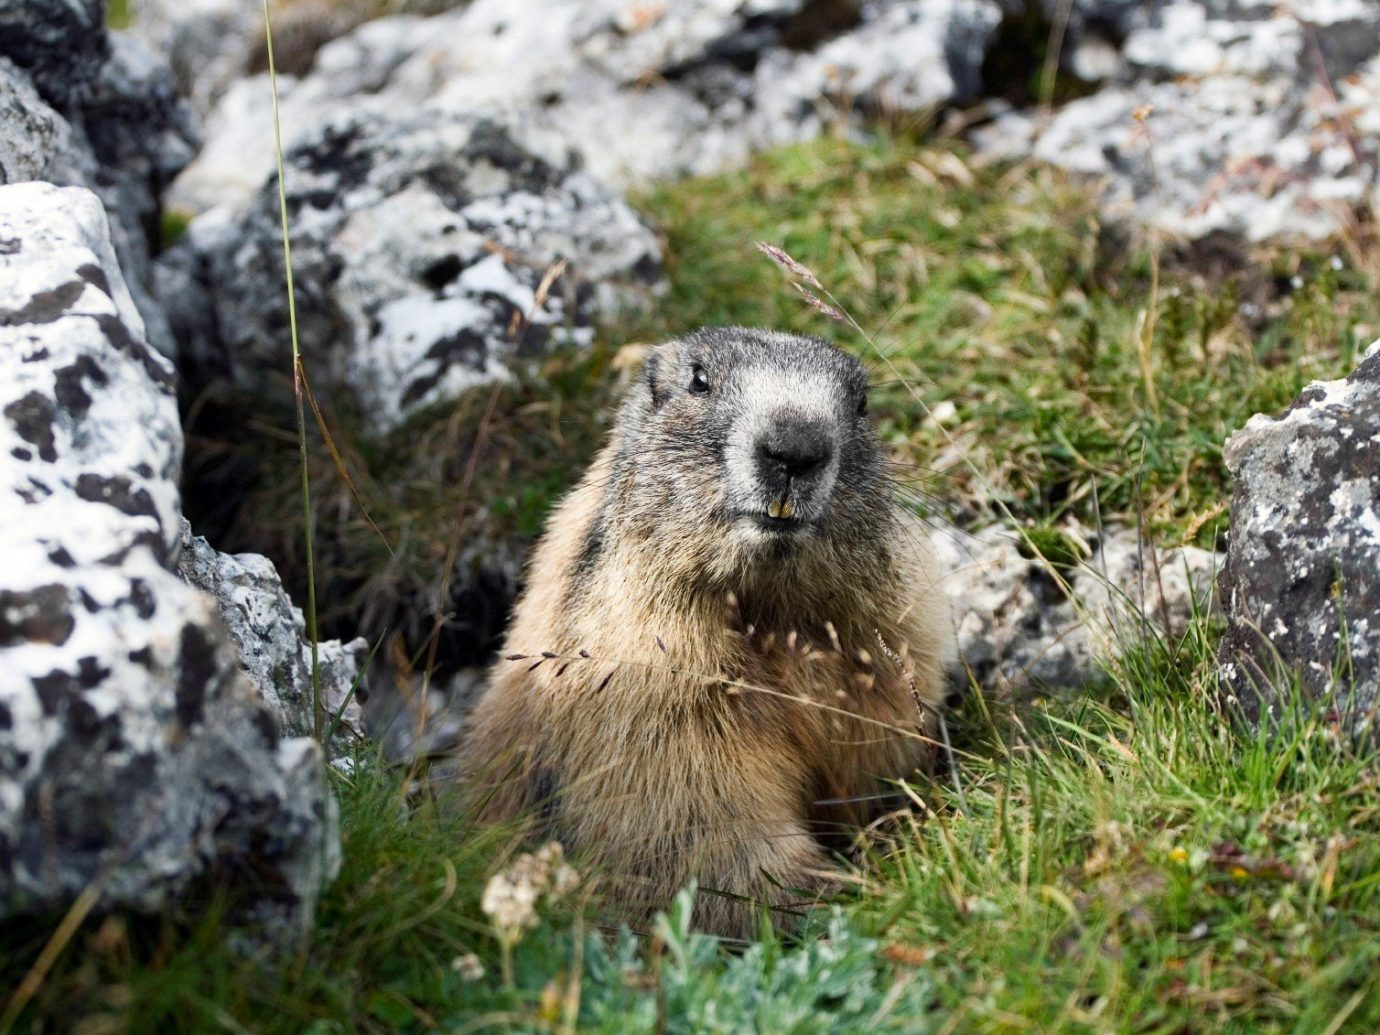 Arts + Culture rock outdoor grass rocky mammal vertebrate Wildlife fauna marmot field prairie dog zoo rodent mustelidae hillside